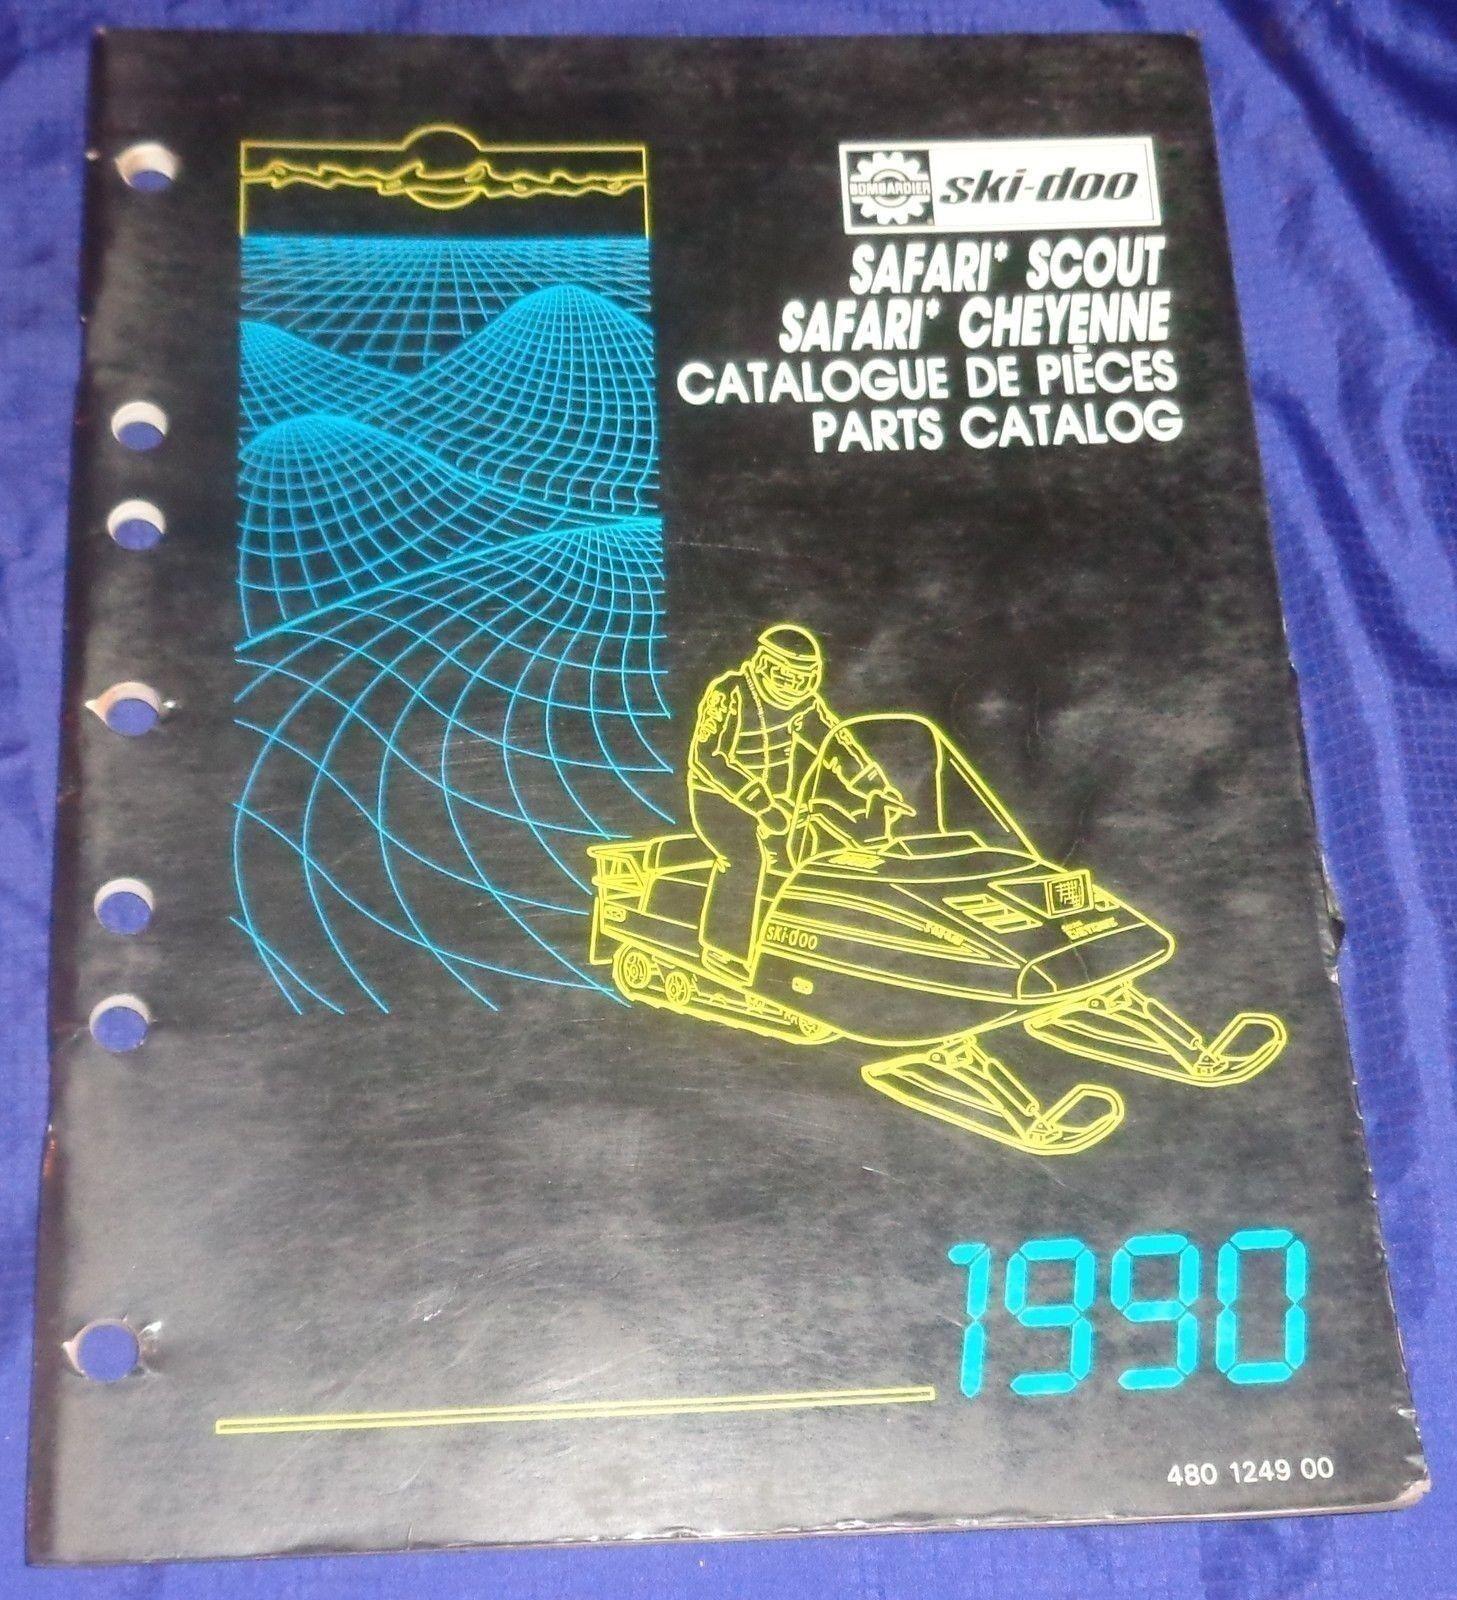 BS686 1990 Ski-Doo Safari Scout Cheyenne Parts Catalog 480 1249 00 Manual